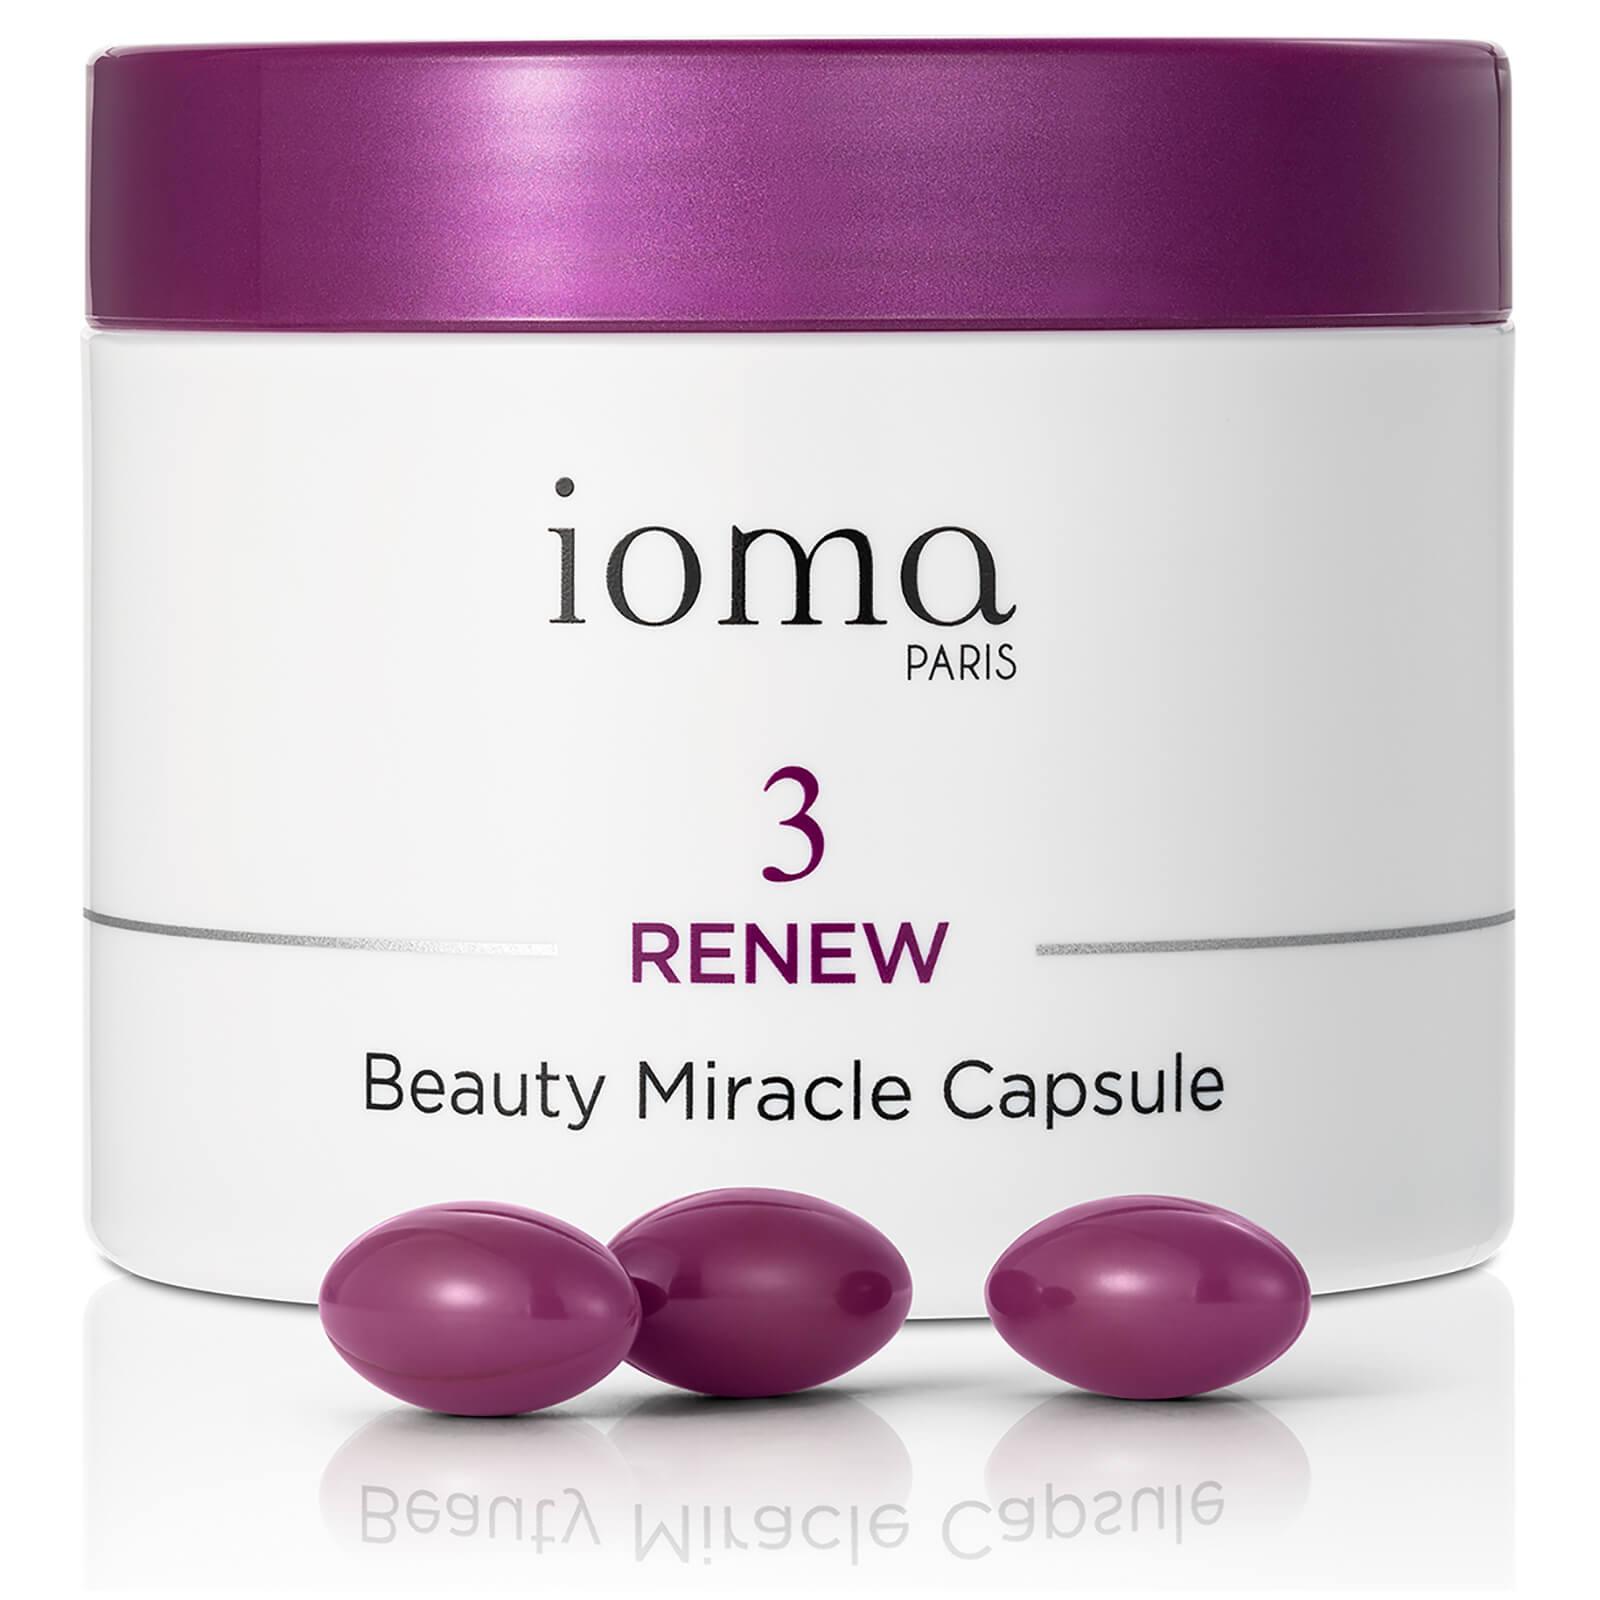 IOMA Beauty Miracle Capsule - integratore pelle, unghie e capelli in capsule molli